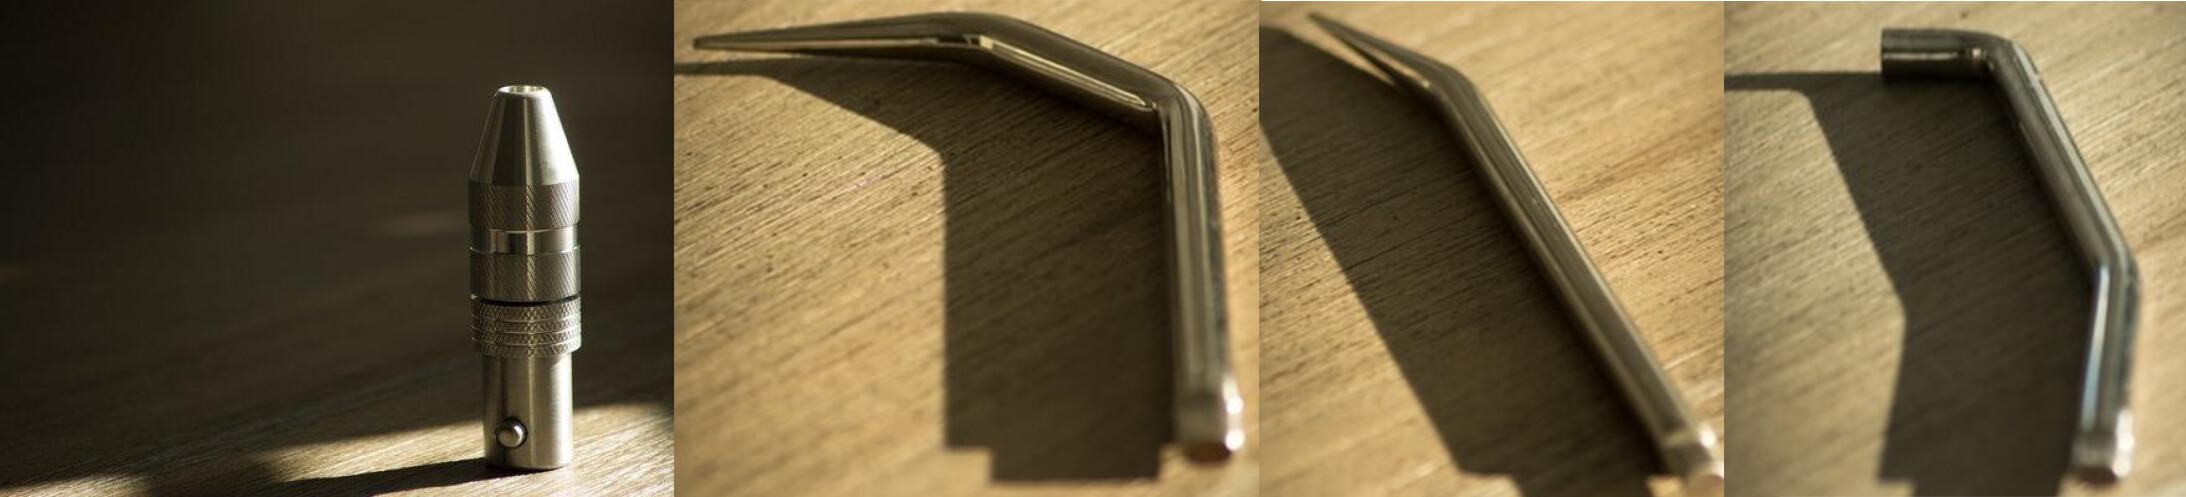 Carbon Tech Paintless Dent Repair Tool Review